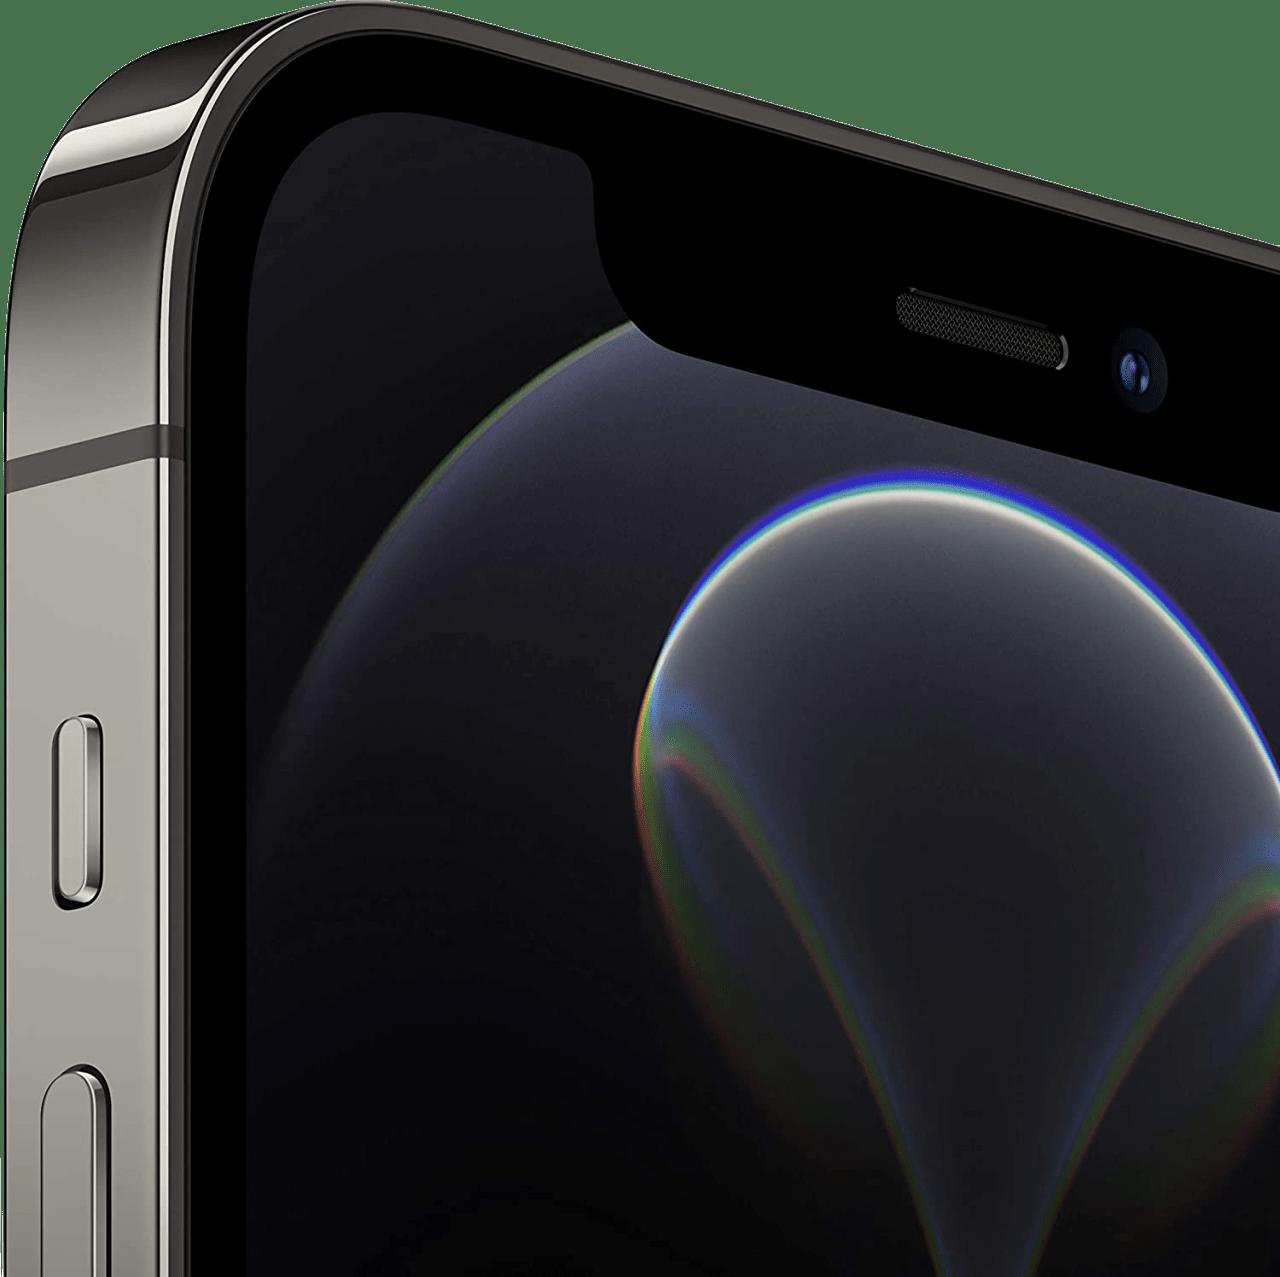 Graphite Apple iPhone 12 Pro 256GB.2